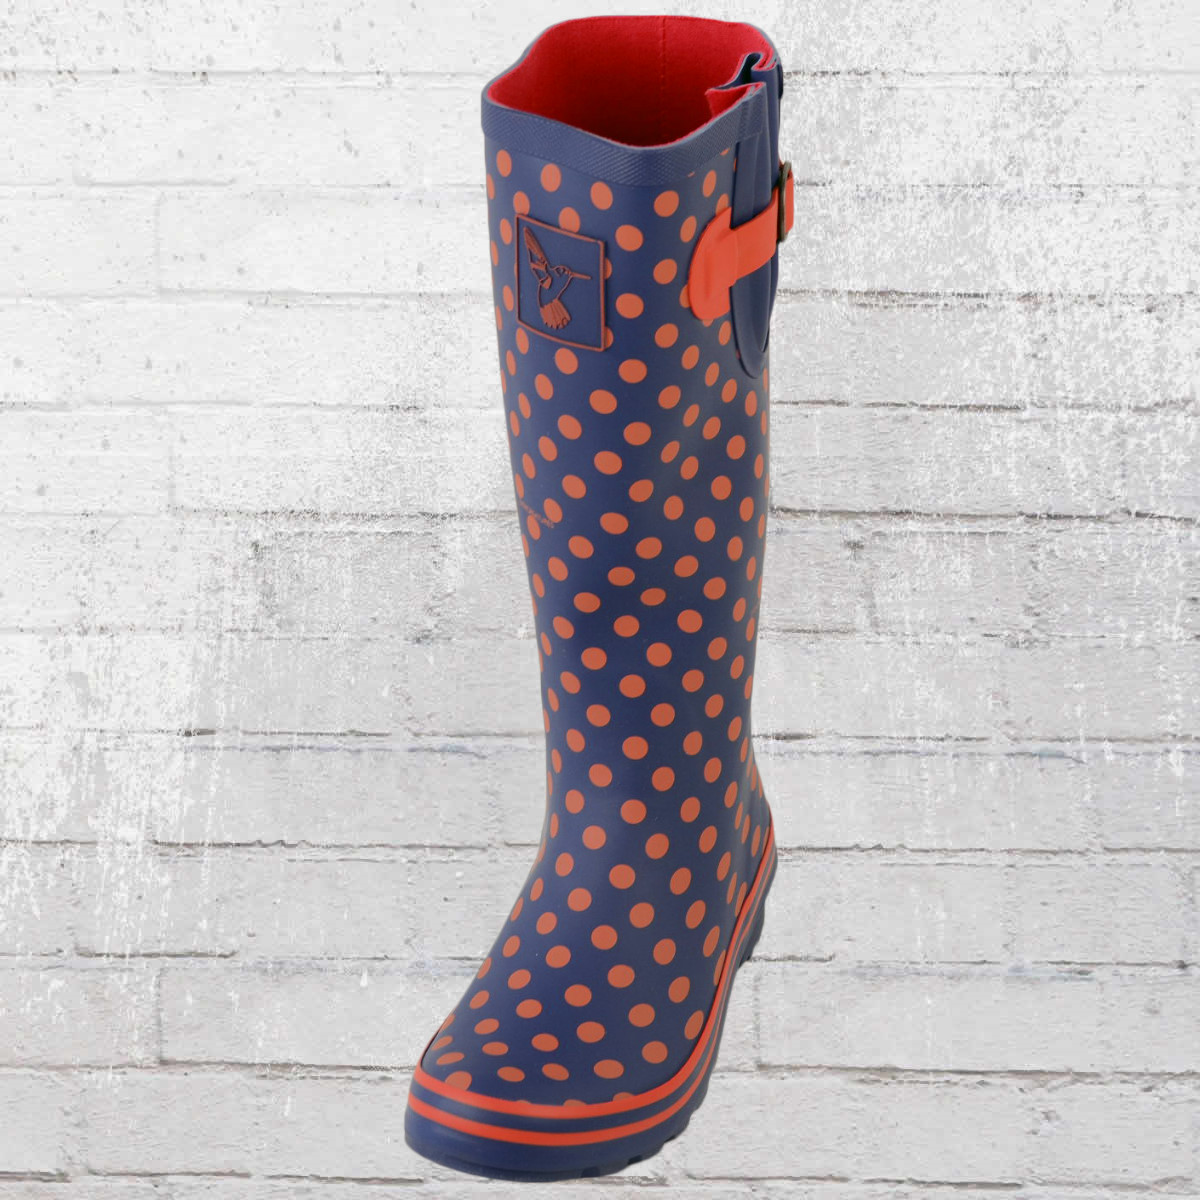 order now evercreatures multisun dots wellington boots. Black Bedroom Furniture Sets. Home Design Ideas